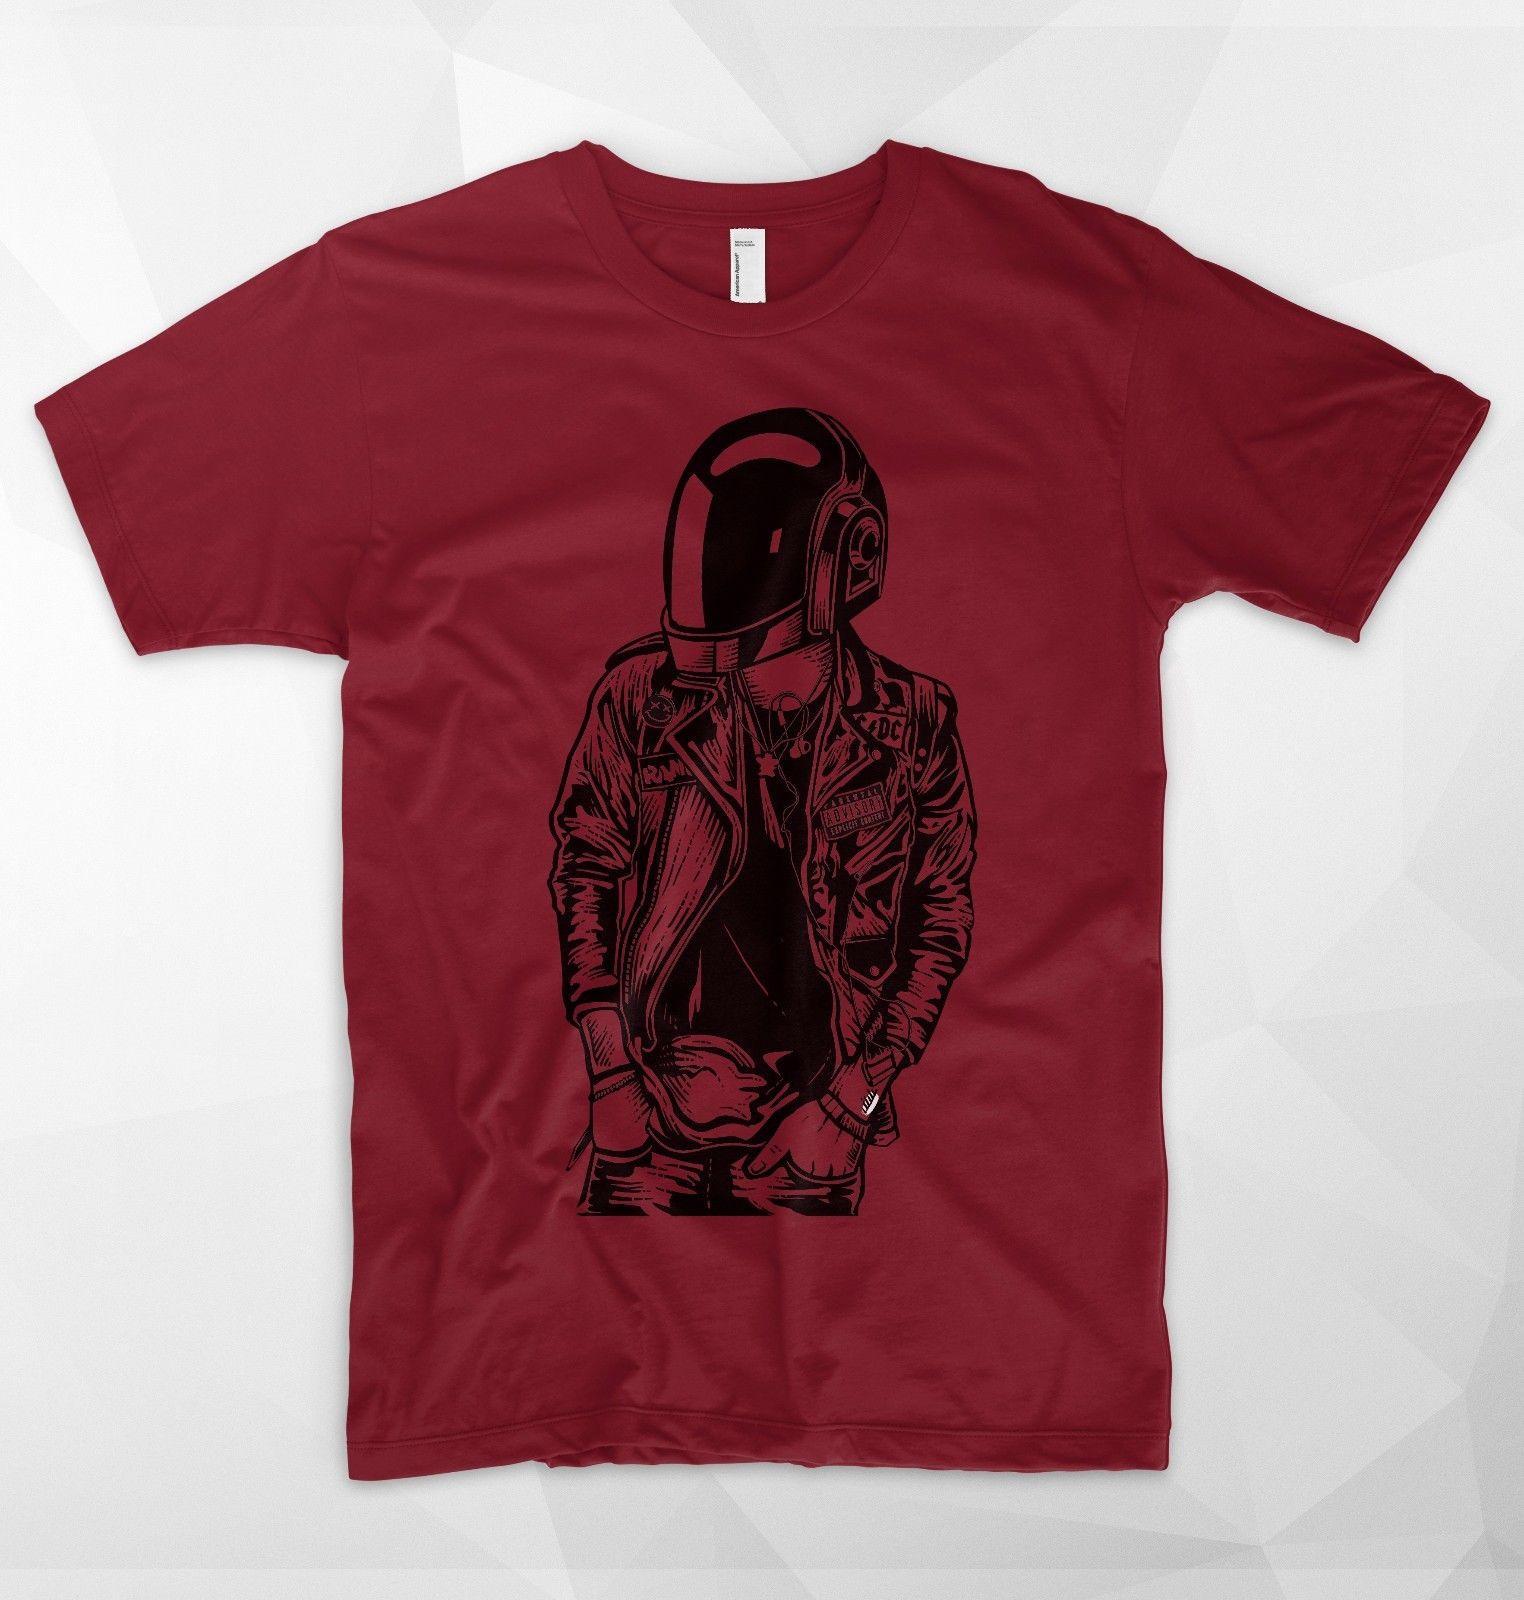 96a68dfecac Daft Punk Punkster T Shirt Top Electronic Music Lover Rebel Random France  Disco Mens 2018 Fashion Brand T Shirt O Neck 100%cotton Buy Funny T Shirts  Shirts ...